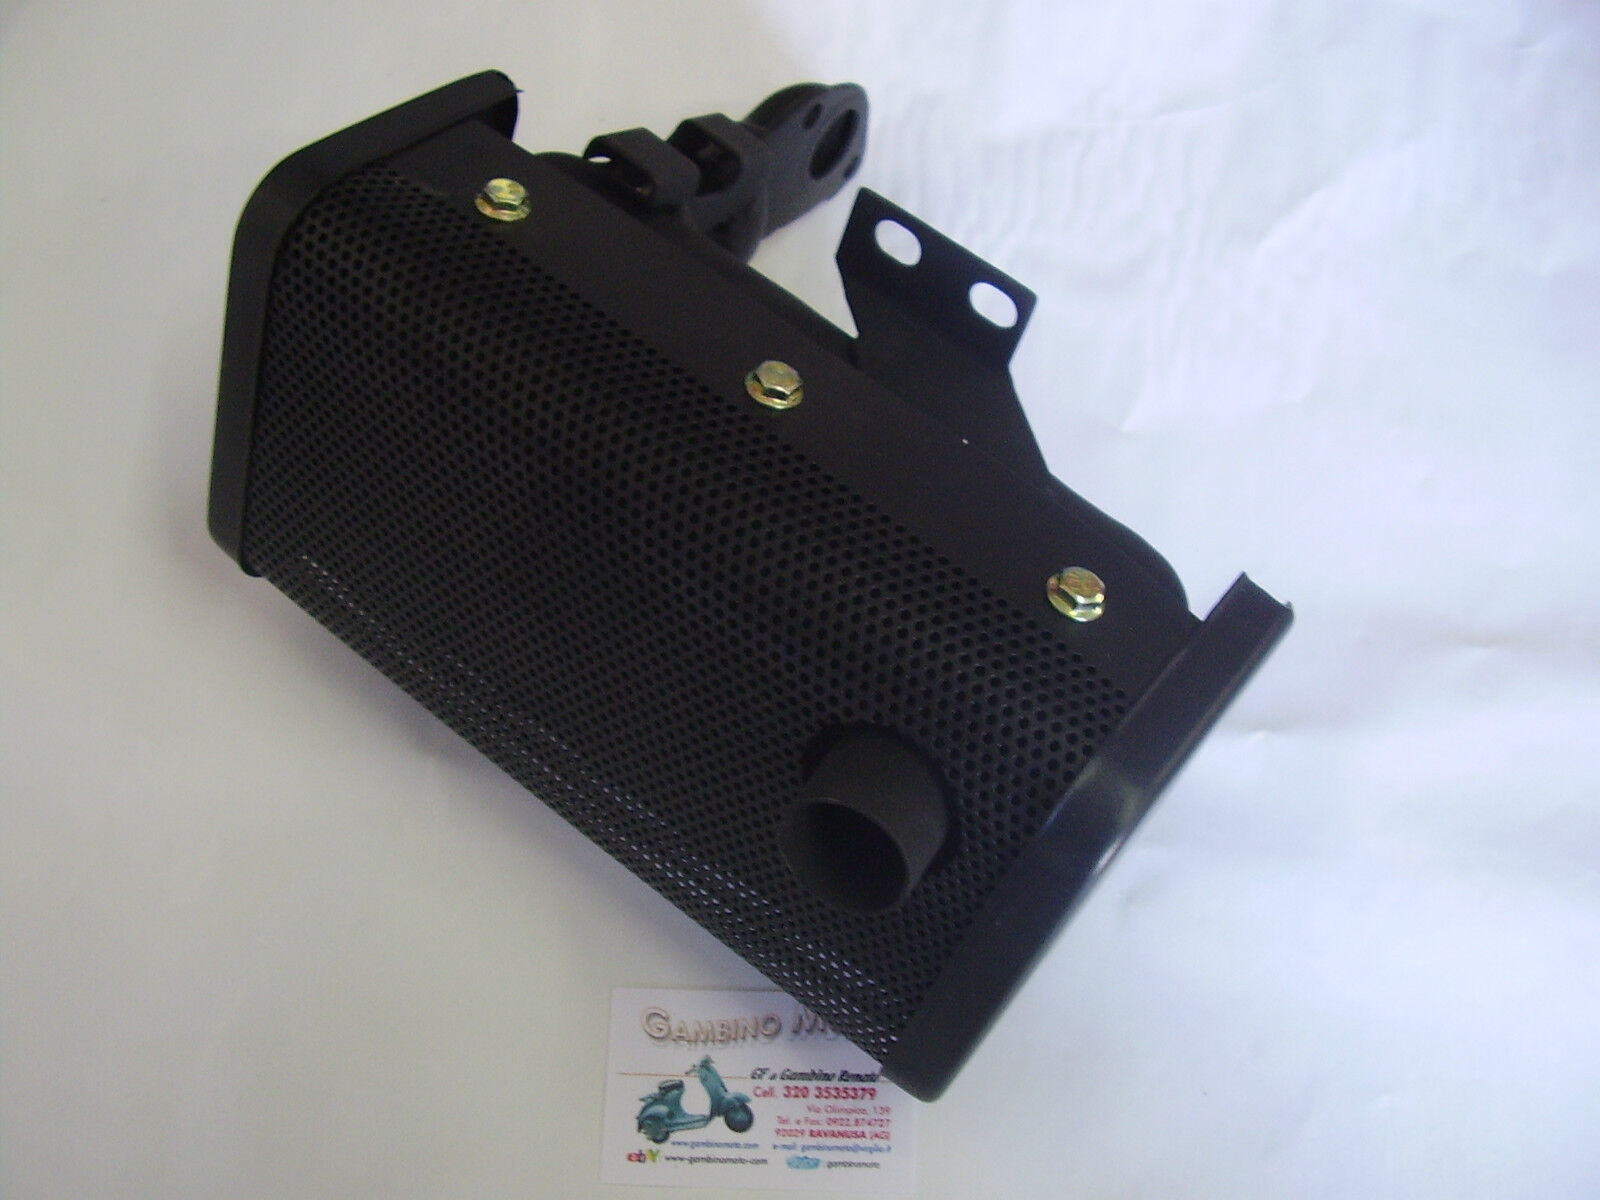 Silenciador Motor Diesel Yanmar 7CV Kama 7CV Zanetti 7CV cm 7CV Ranmay 7CV